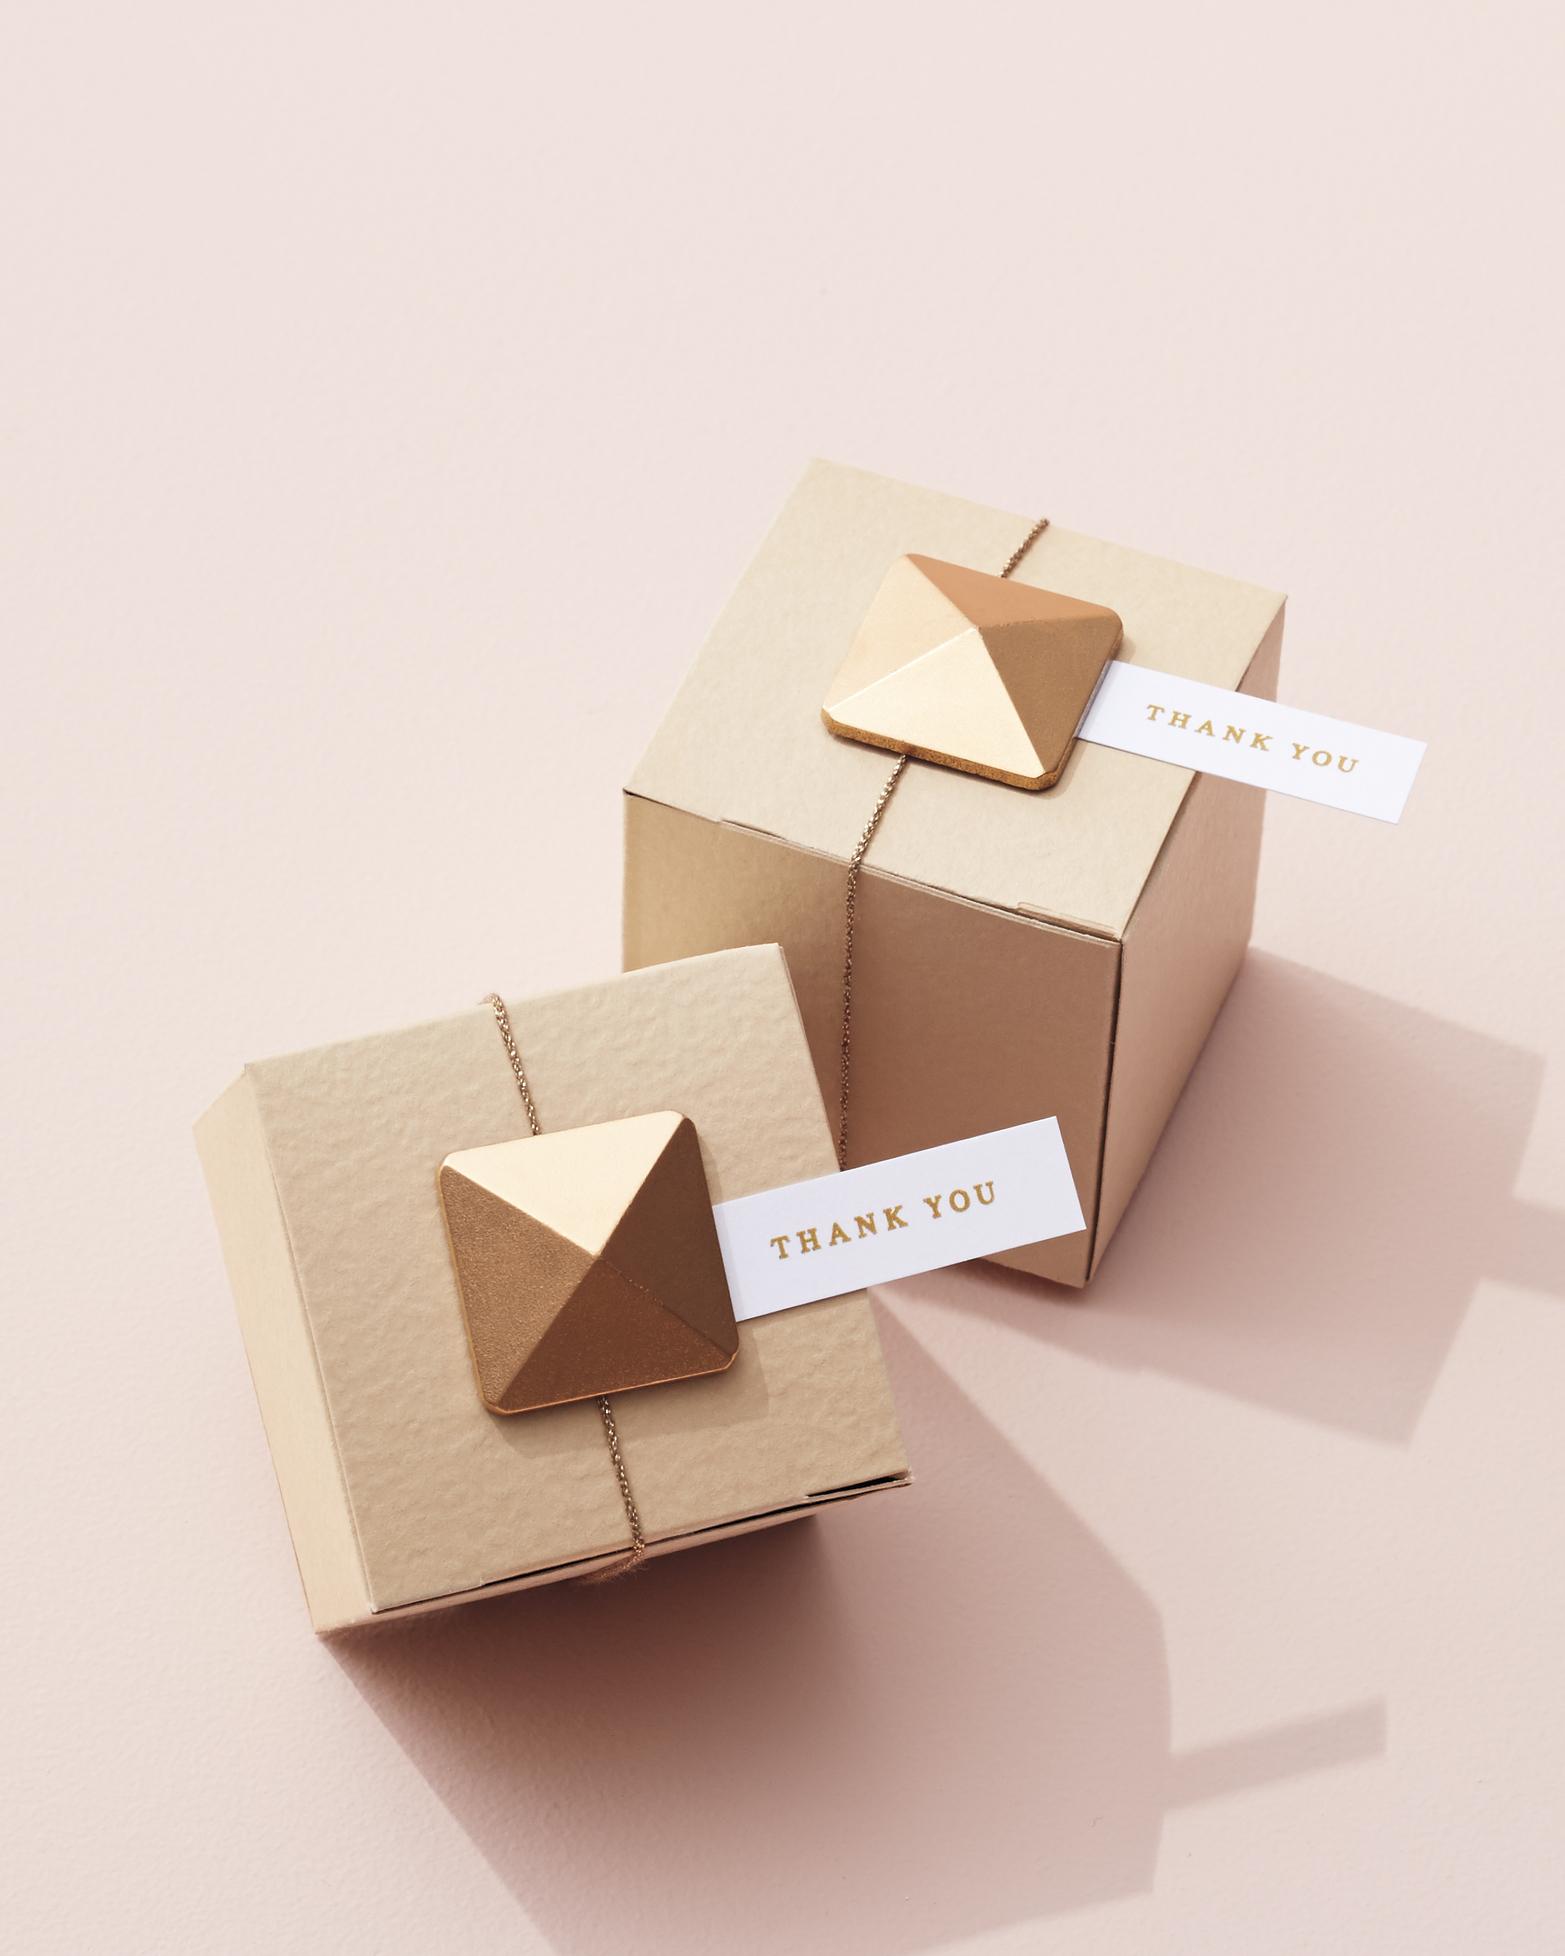 box-studs-058-d111930.jpg